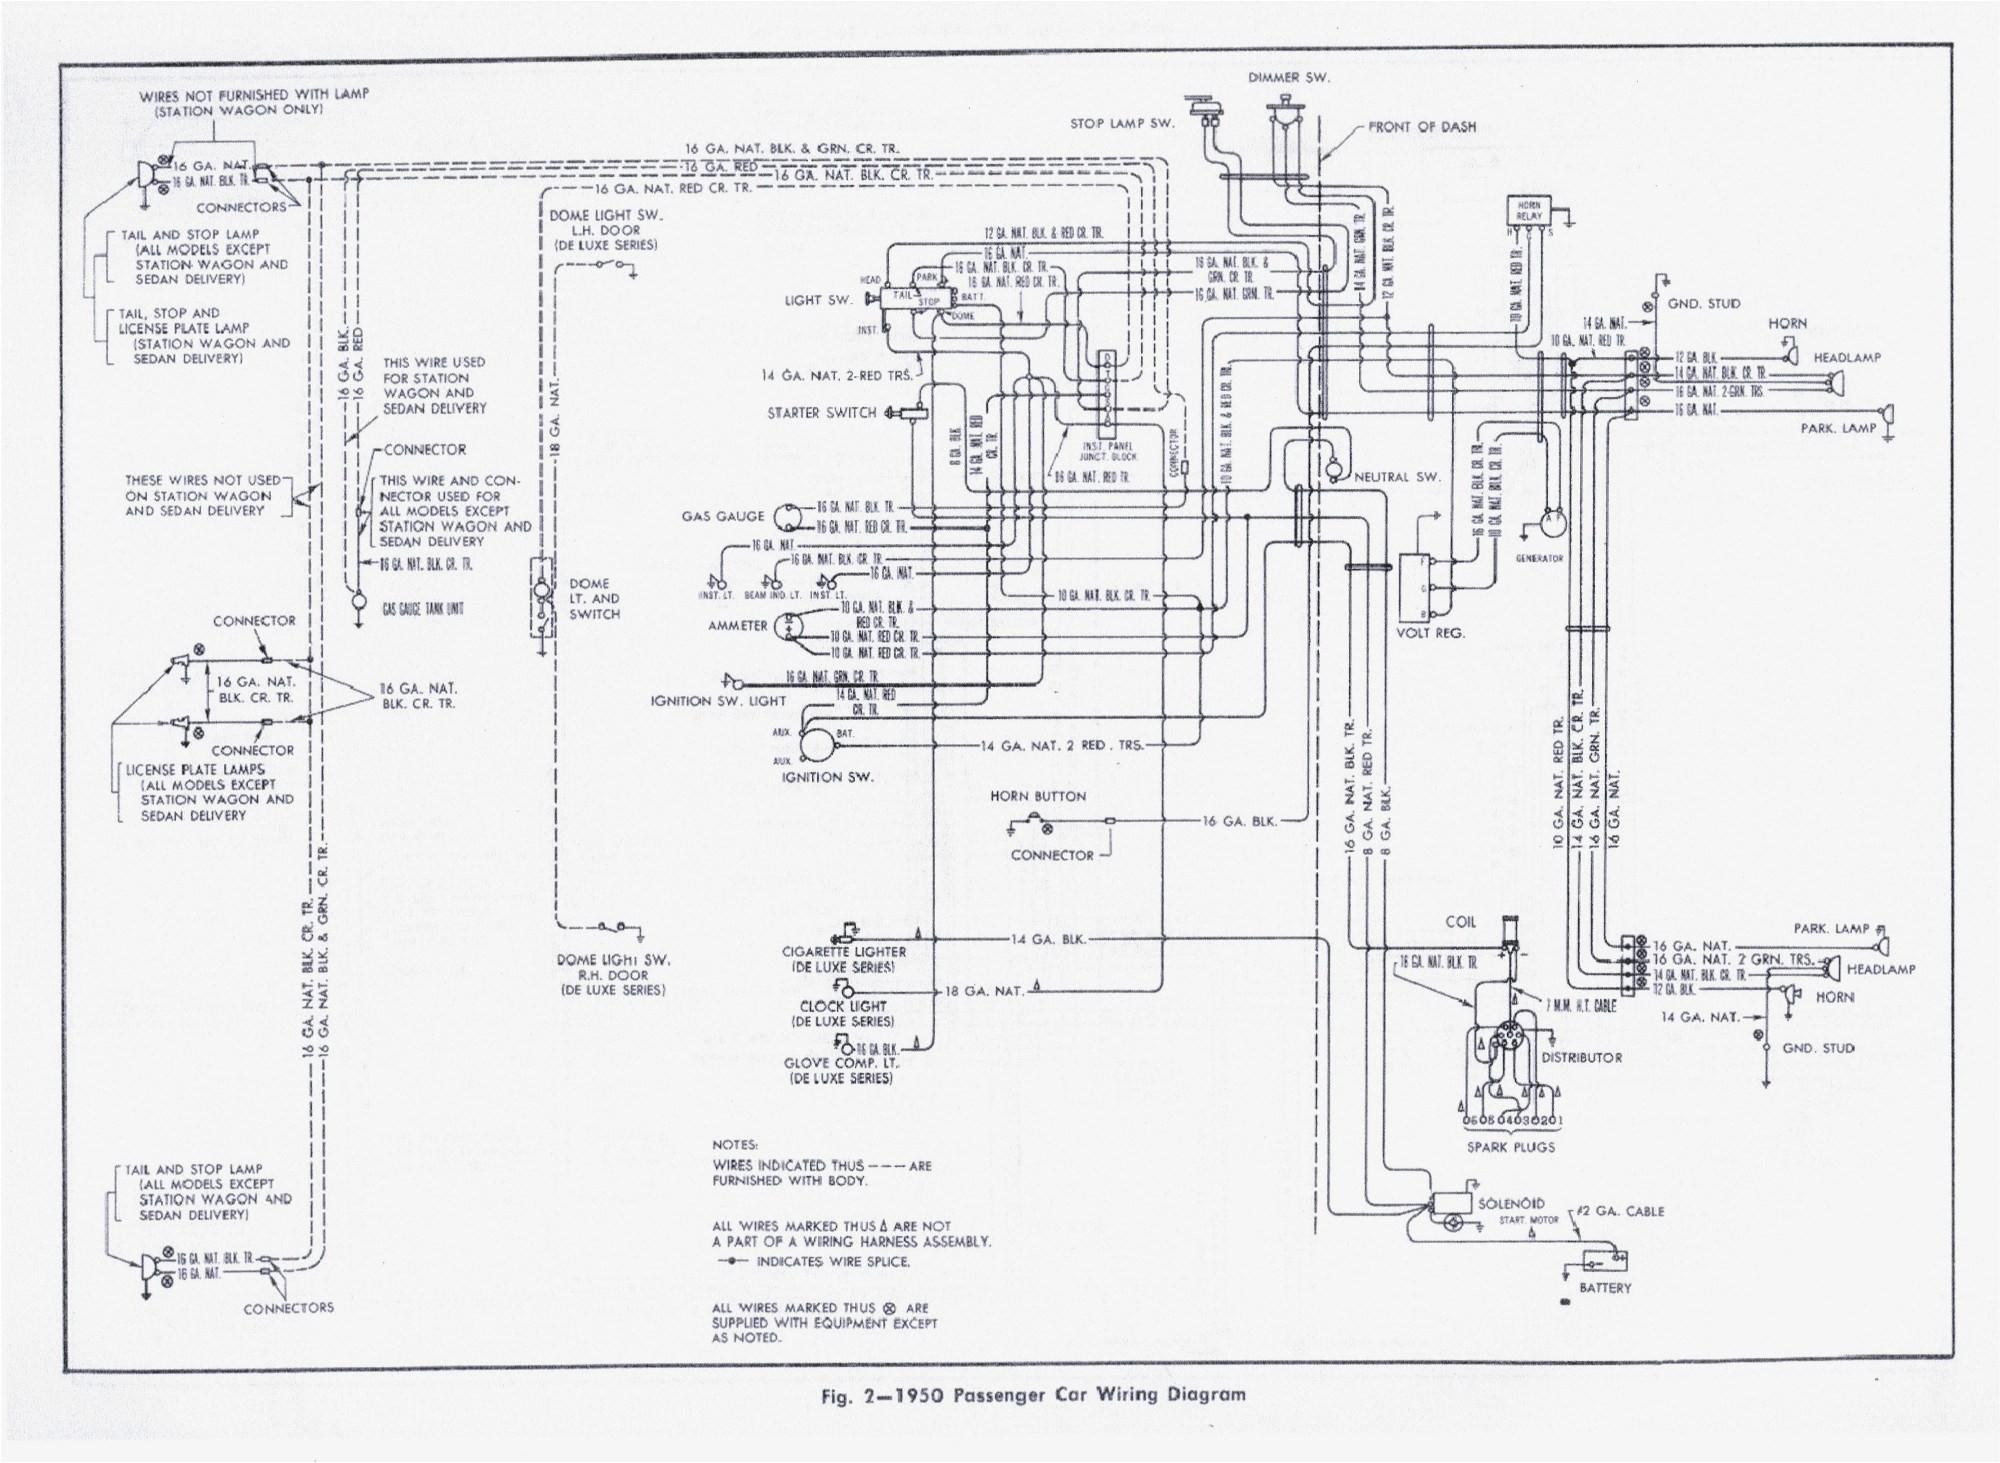 Razor 200 Electric Scooter Wiring Diagram. Razor 650